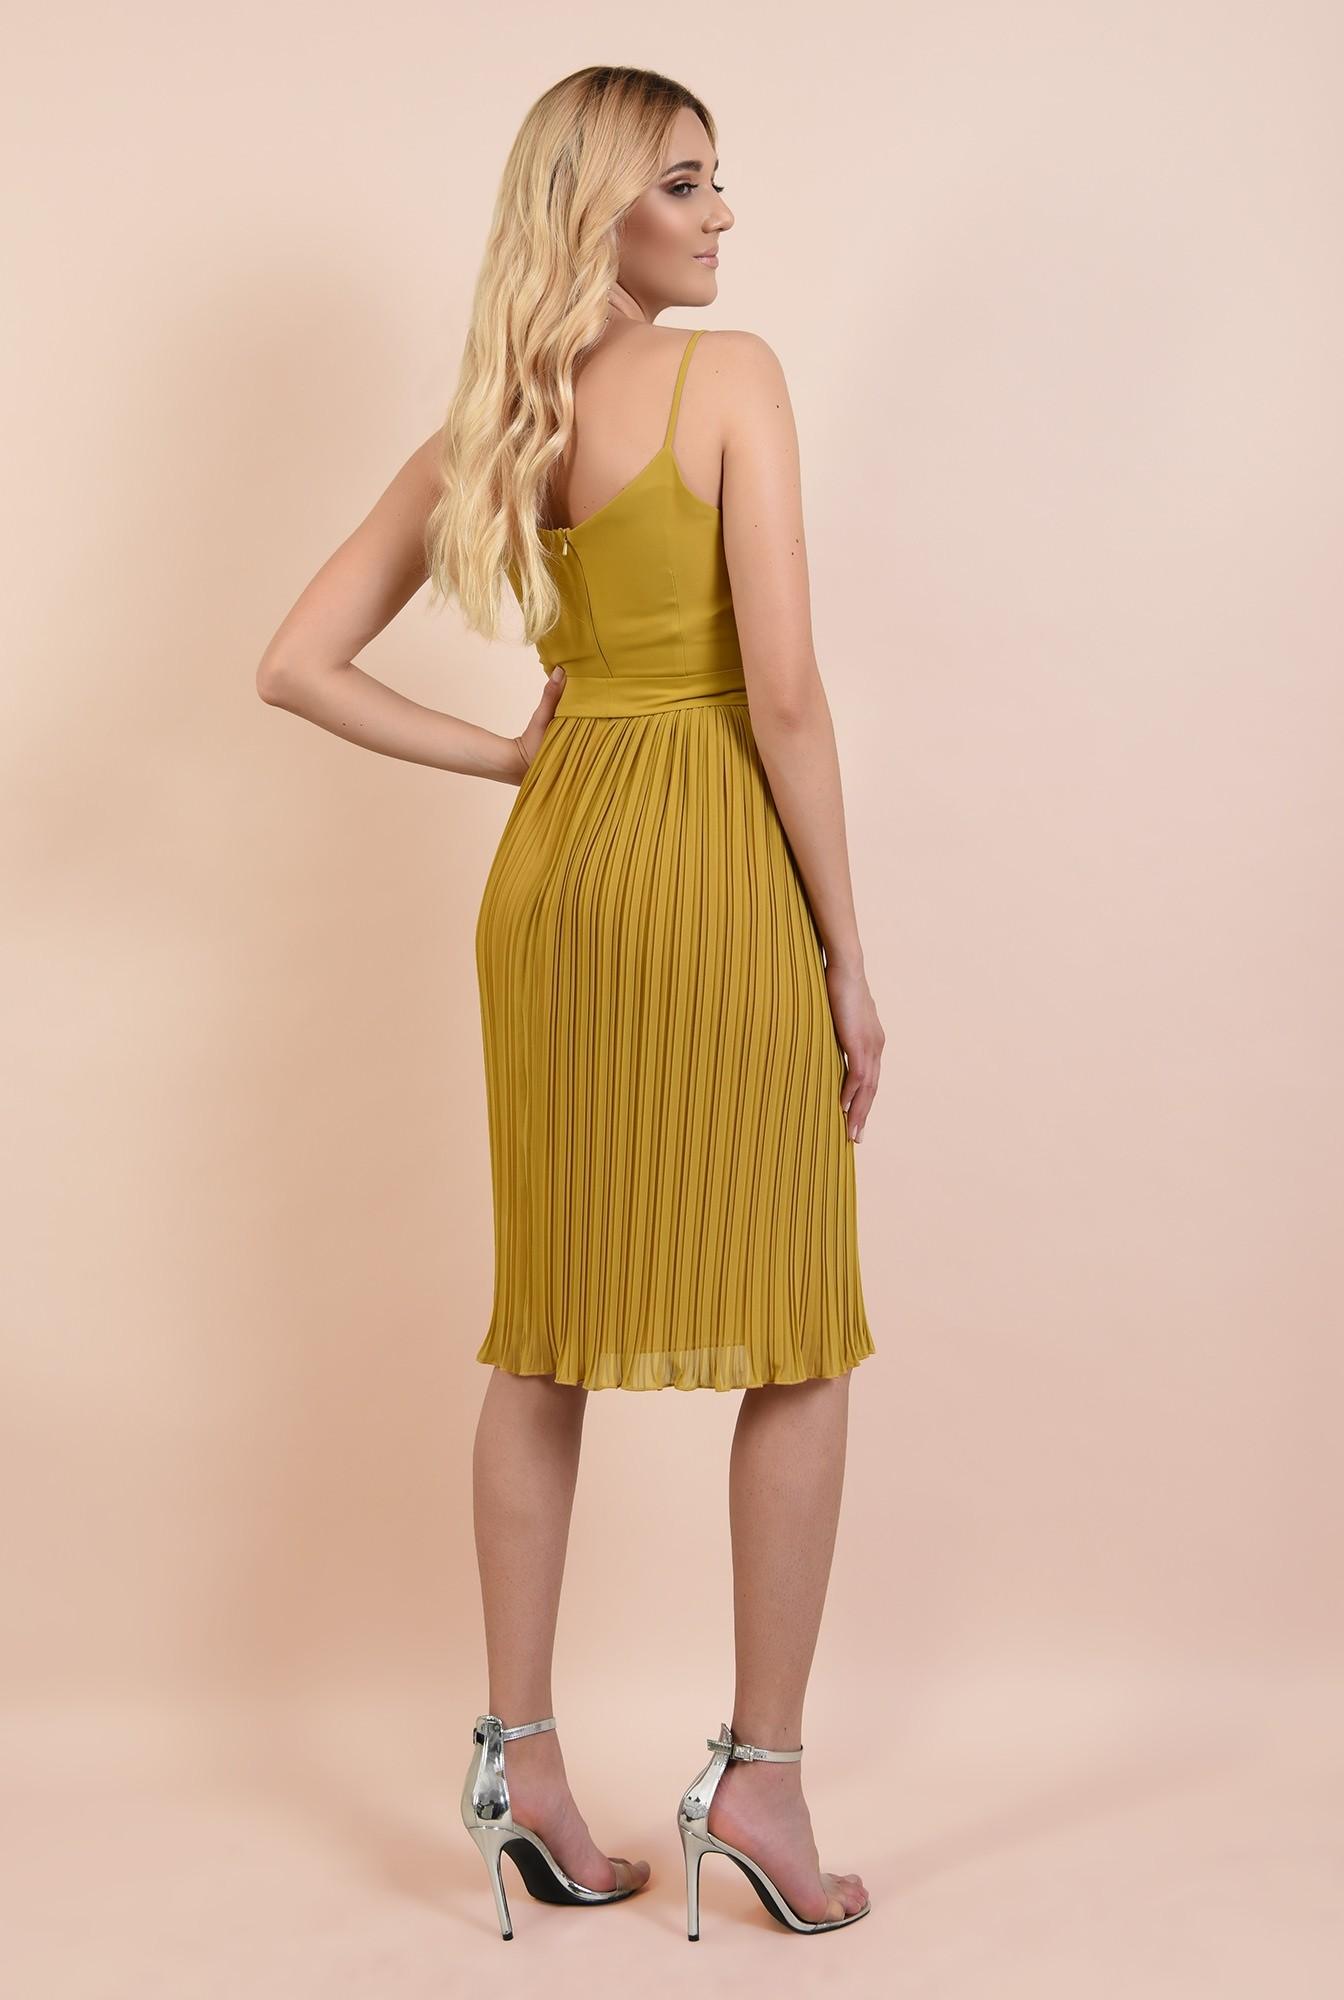 1 - 360 - rochie eleganta, mustar, cu bretele spaghetti, cordon in talie, fusta plisata